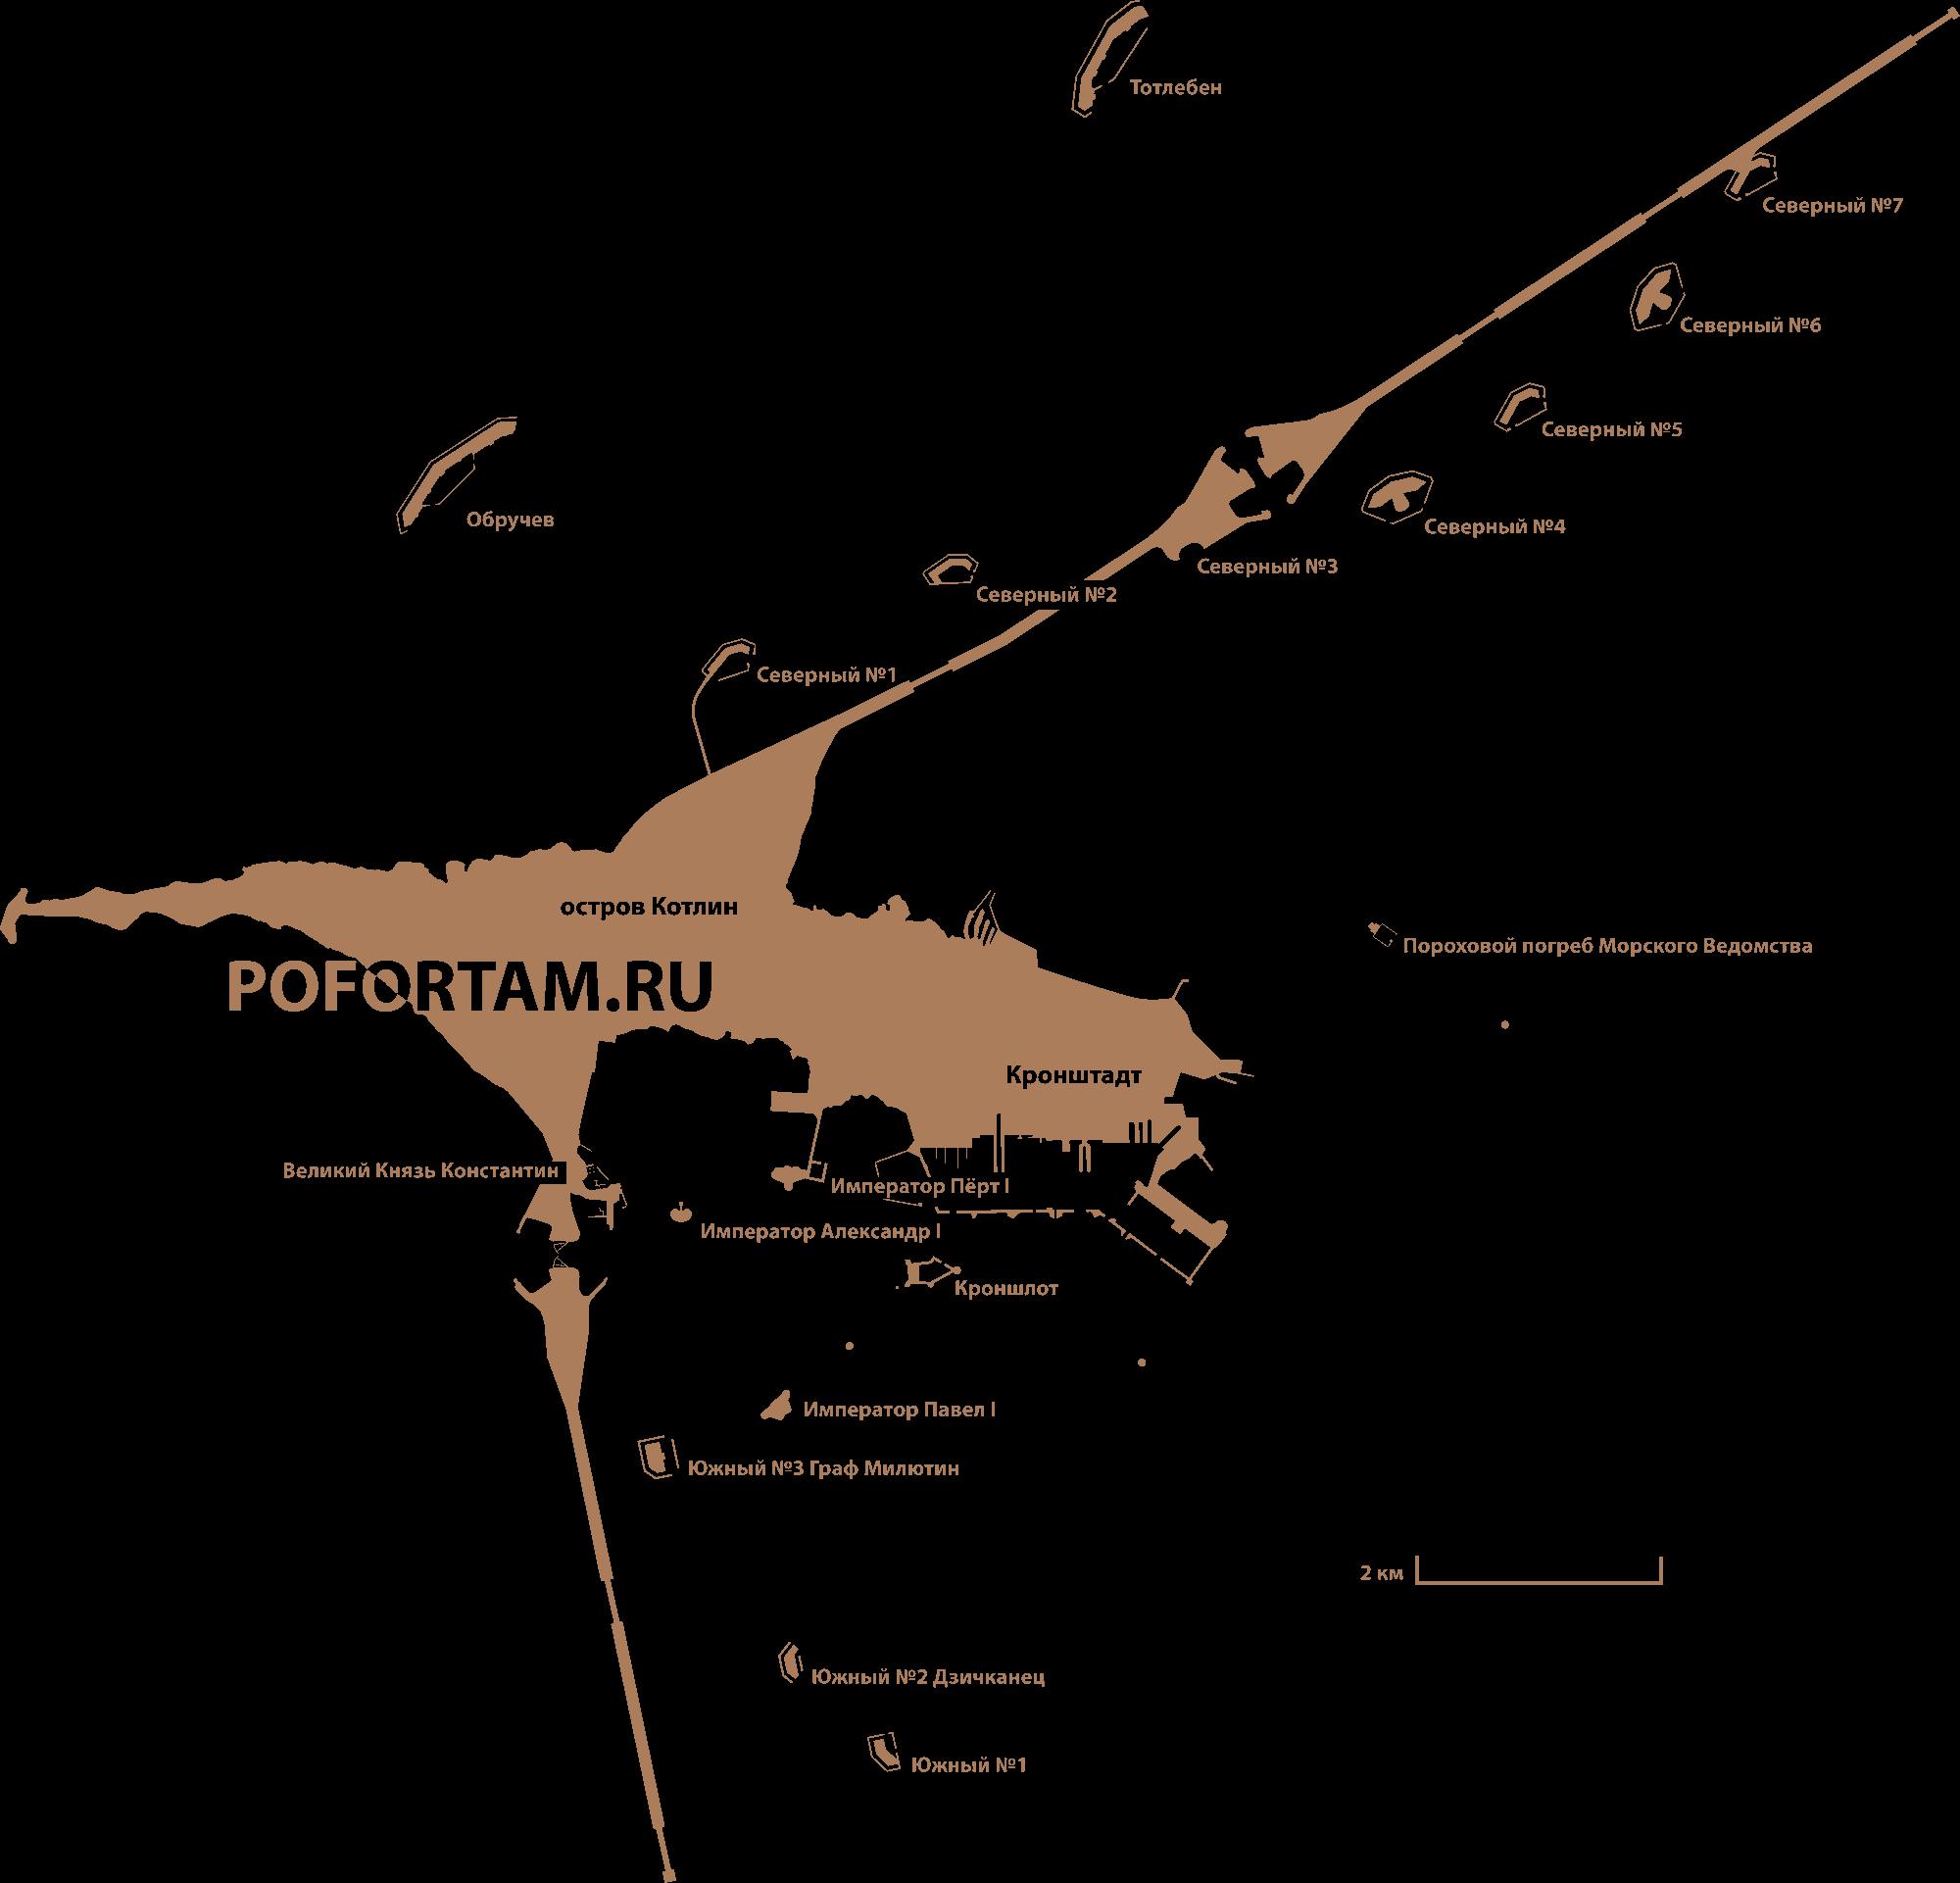 Карта фортов Кронштадта